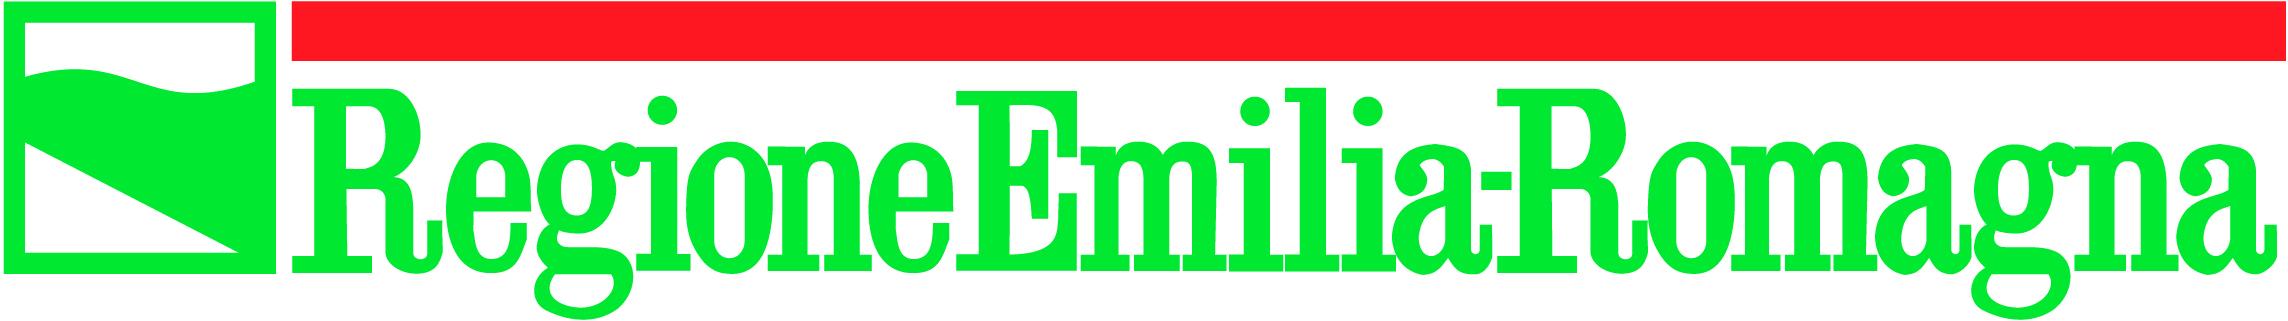 logo_regione_colori.jpg